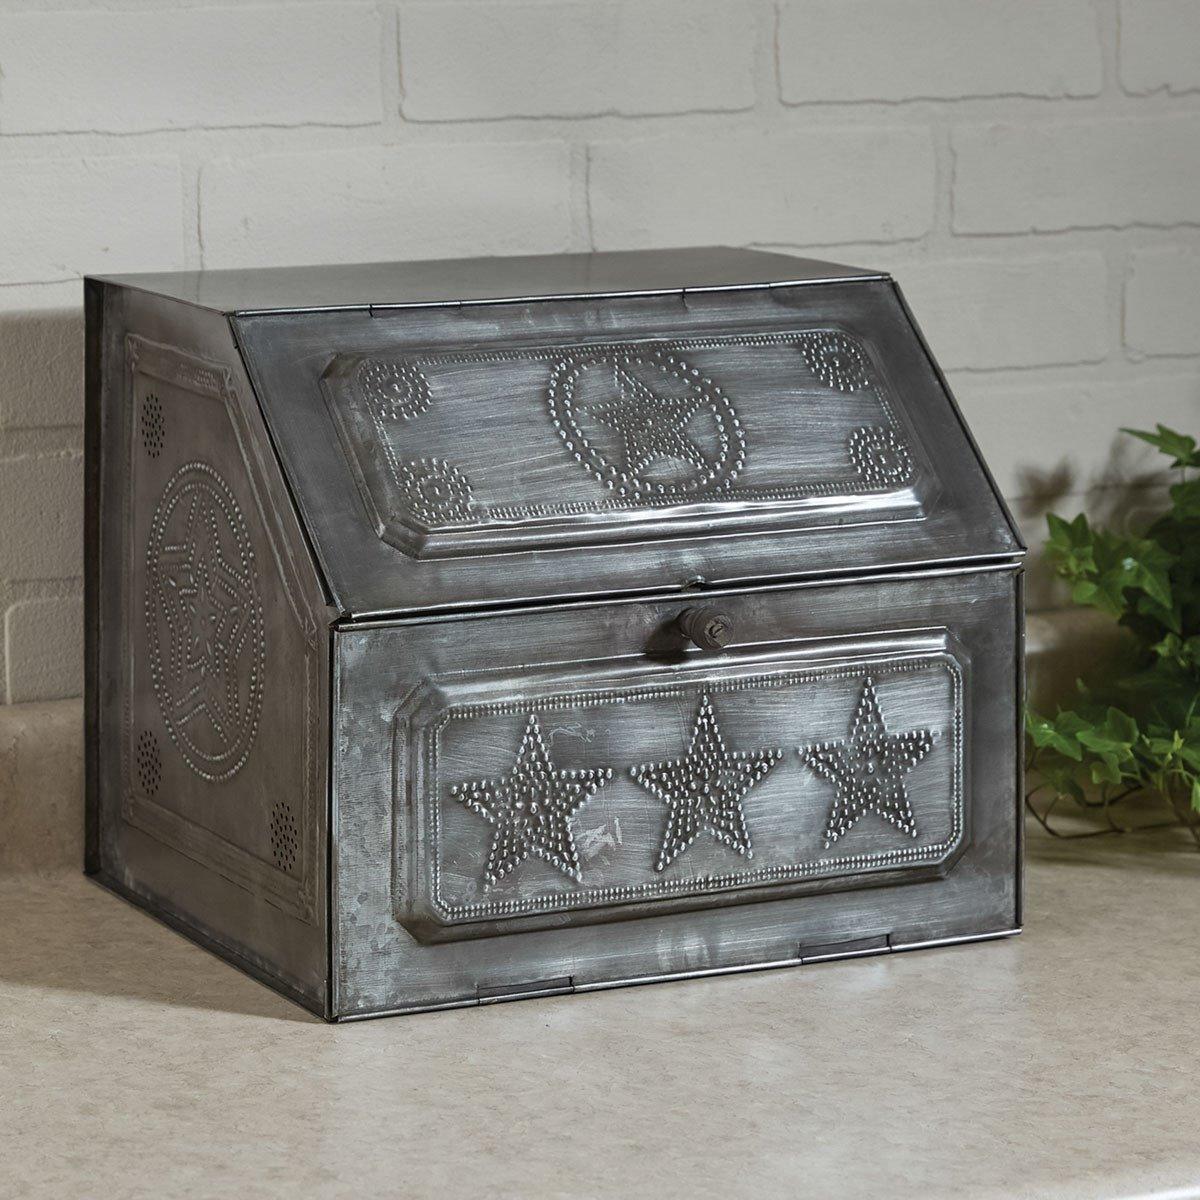 Galvanized Metal Pierced Star Bread Box